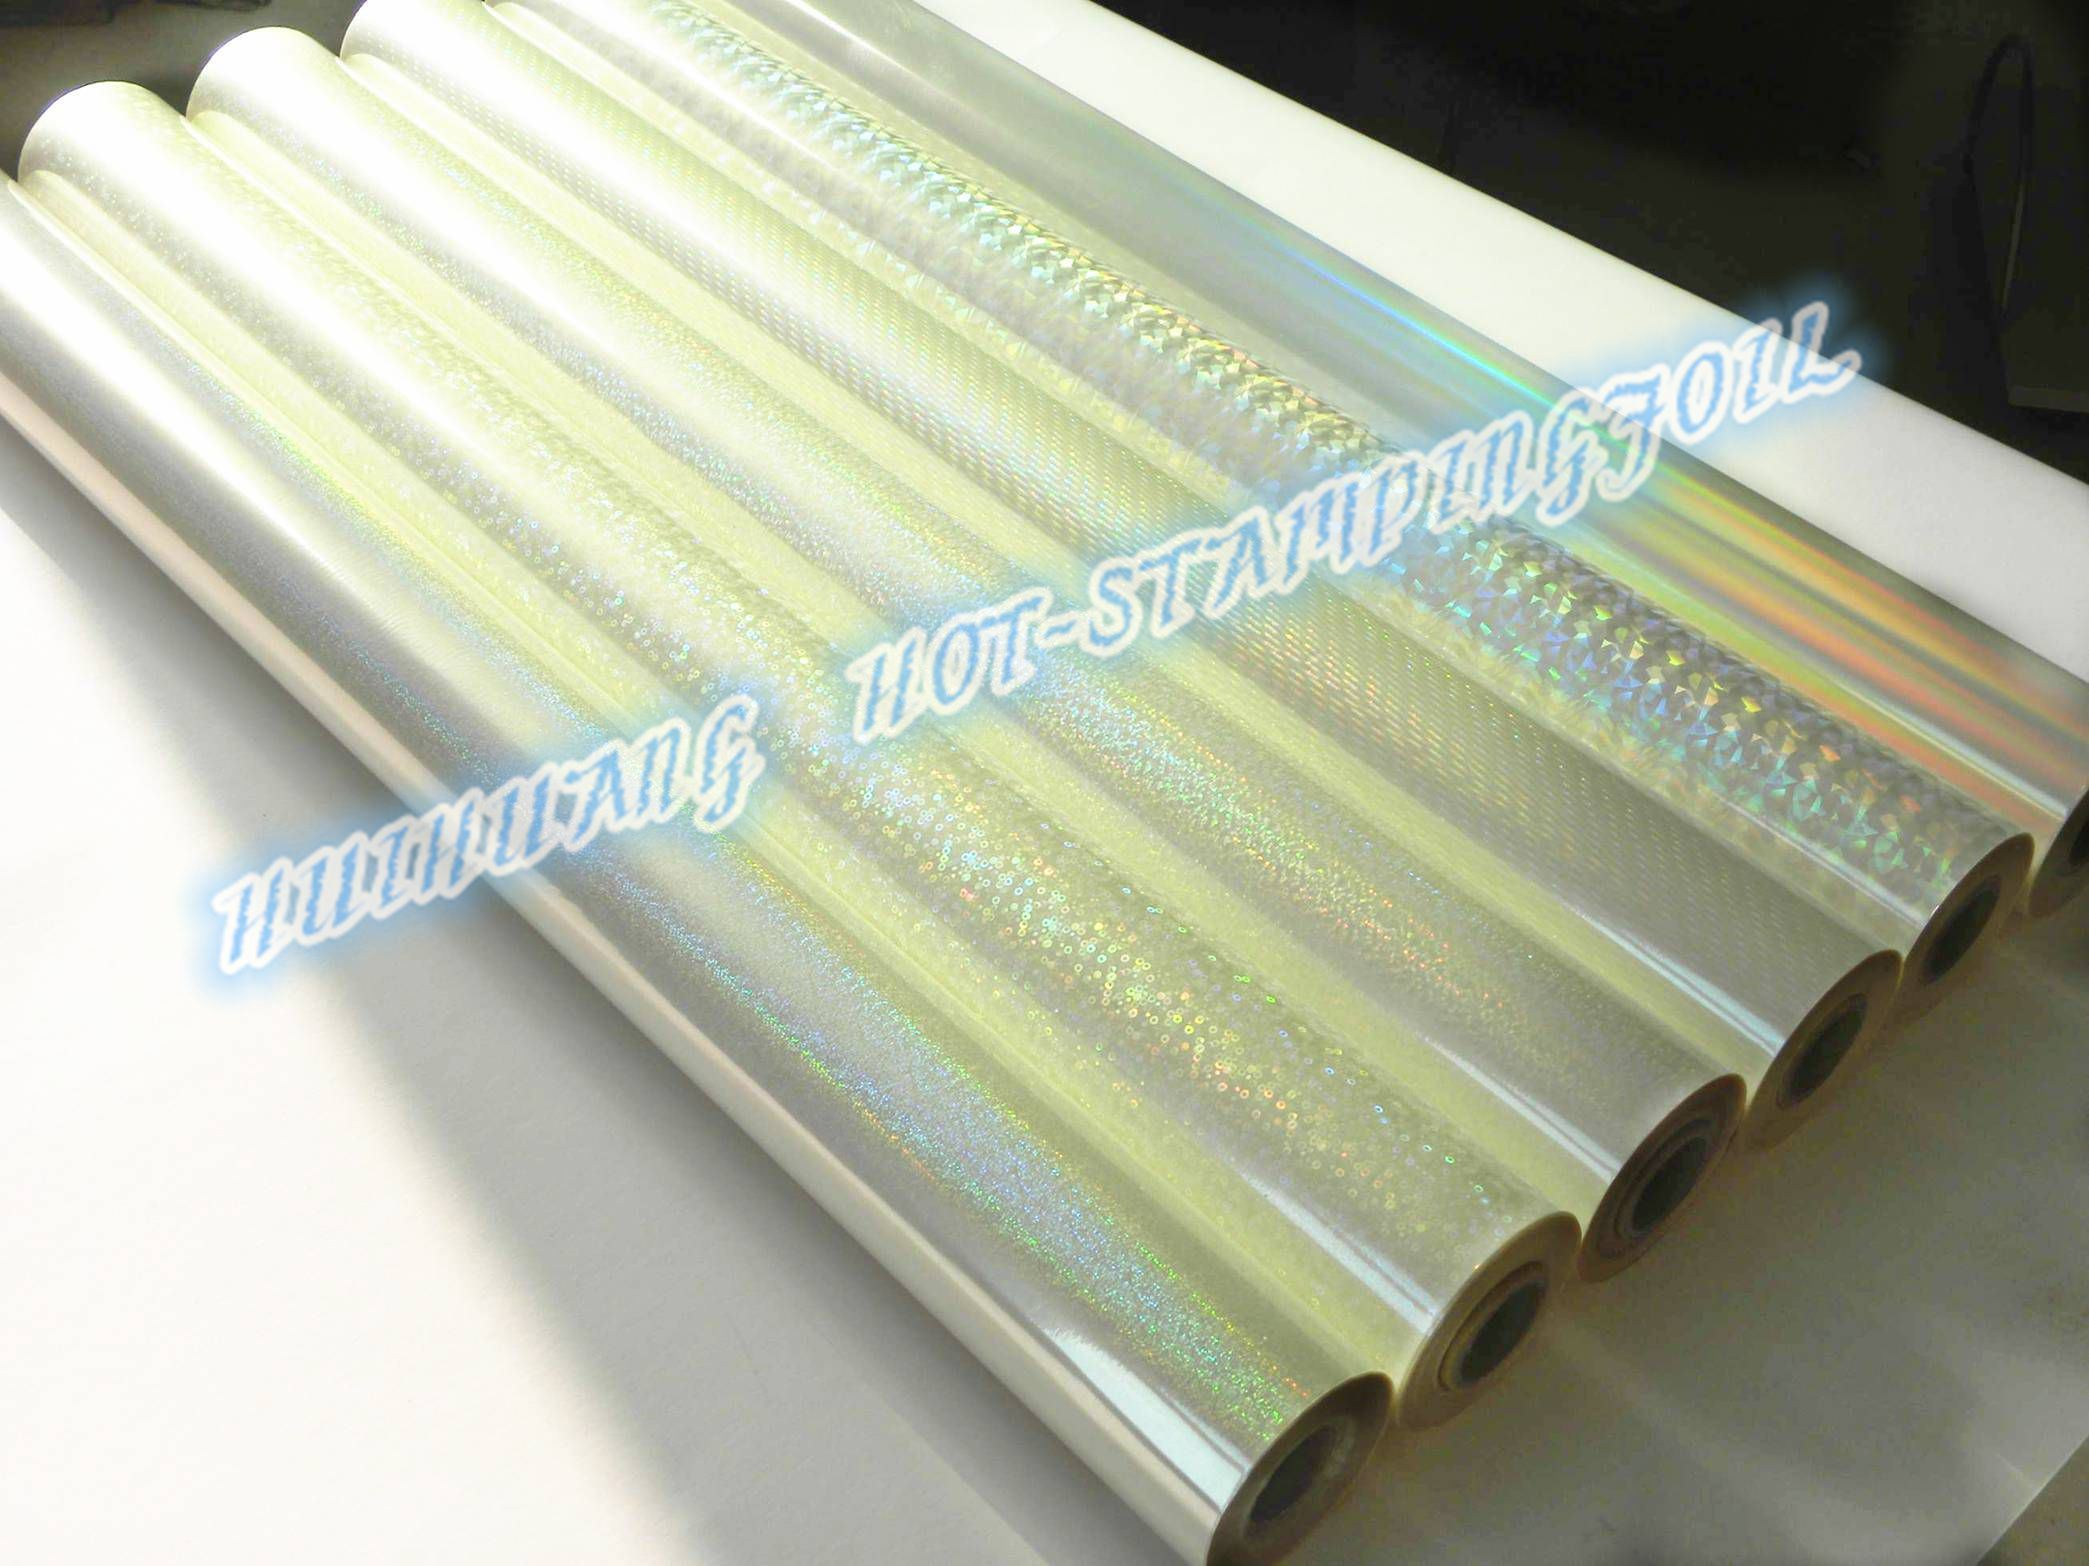 Transparent Holographic Hot Stamping Foil